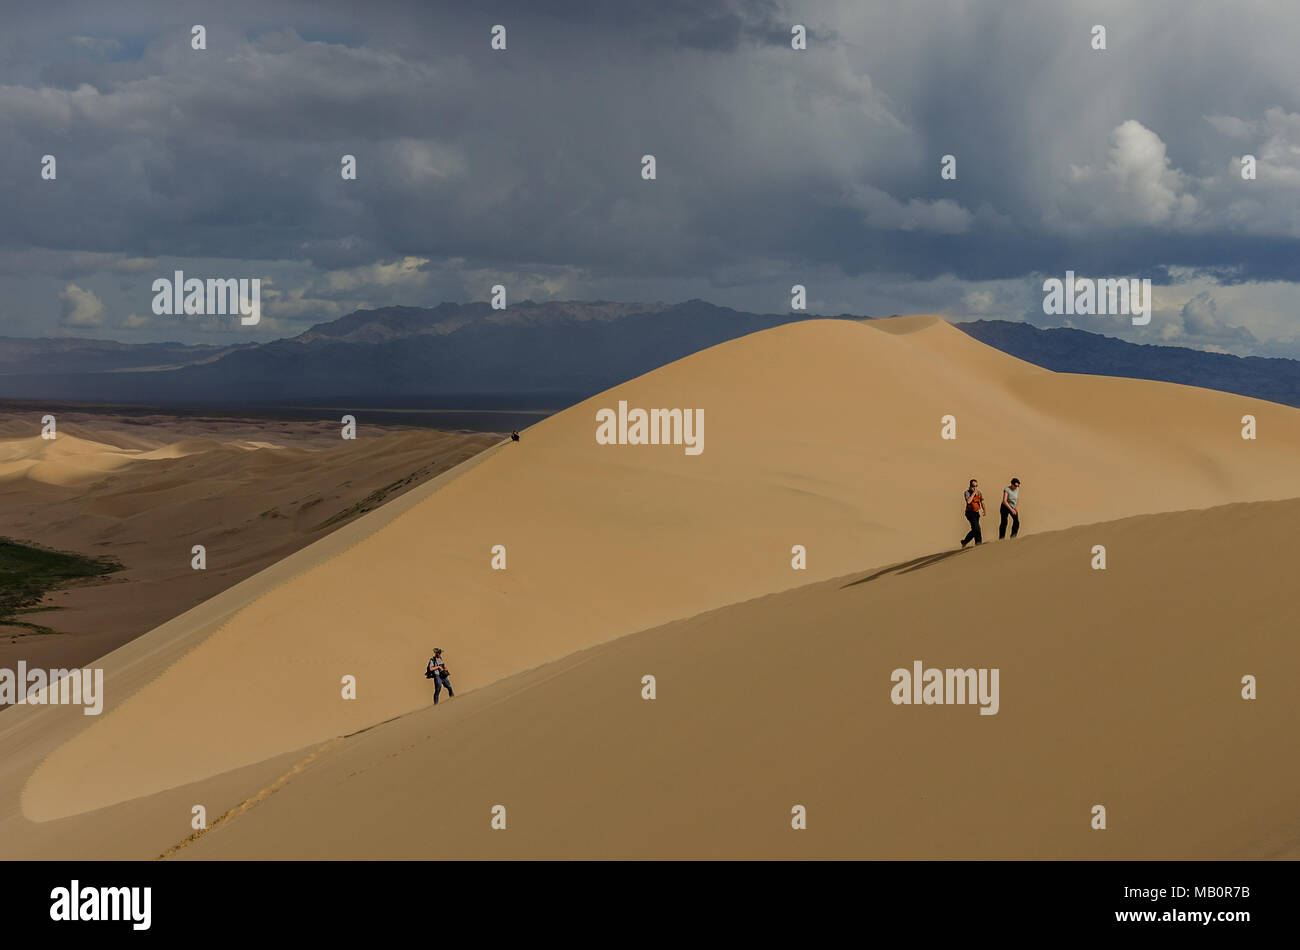 Climbing up the Khongoryn Els, Gobi Desert, Mongolia - Stock Image